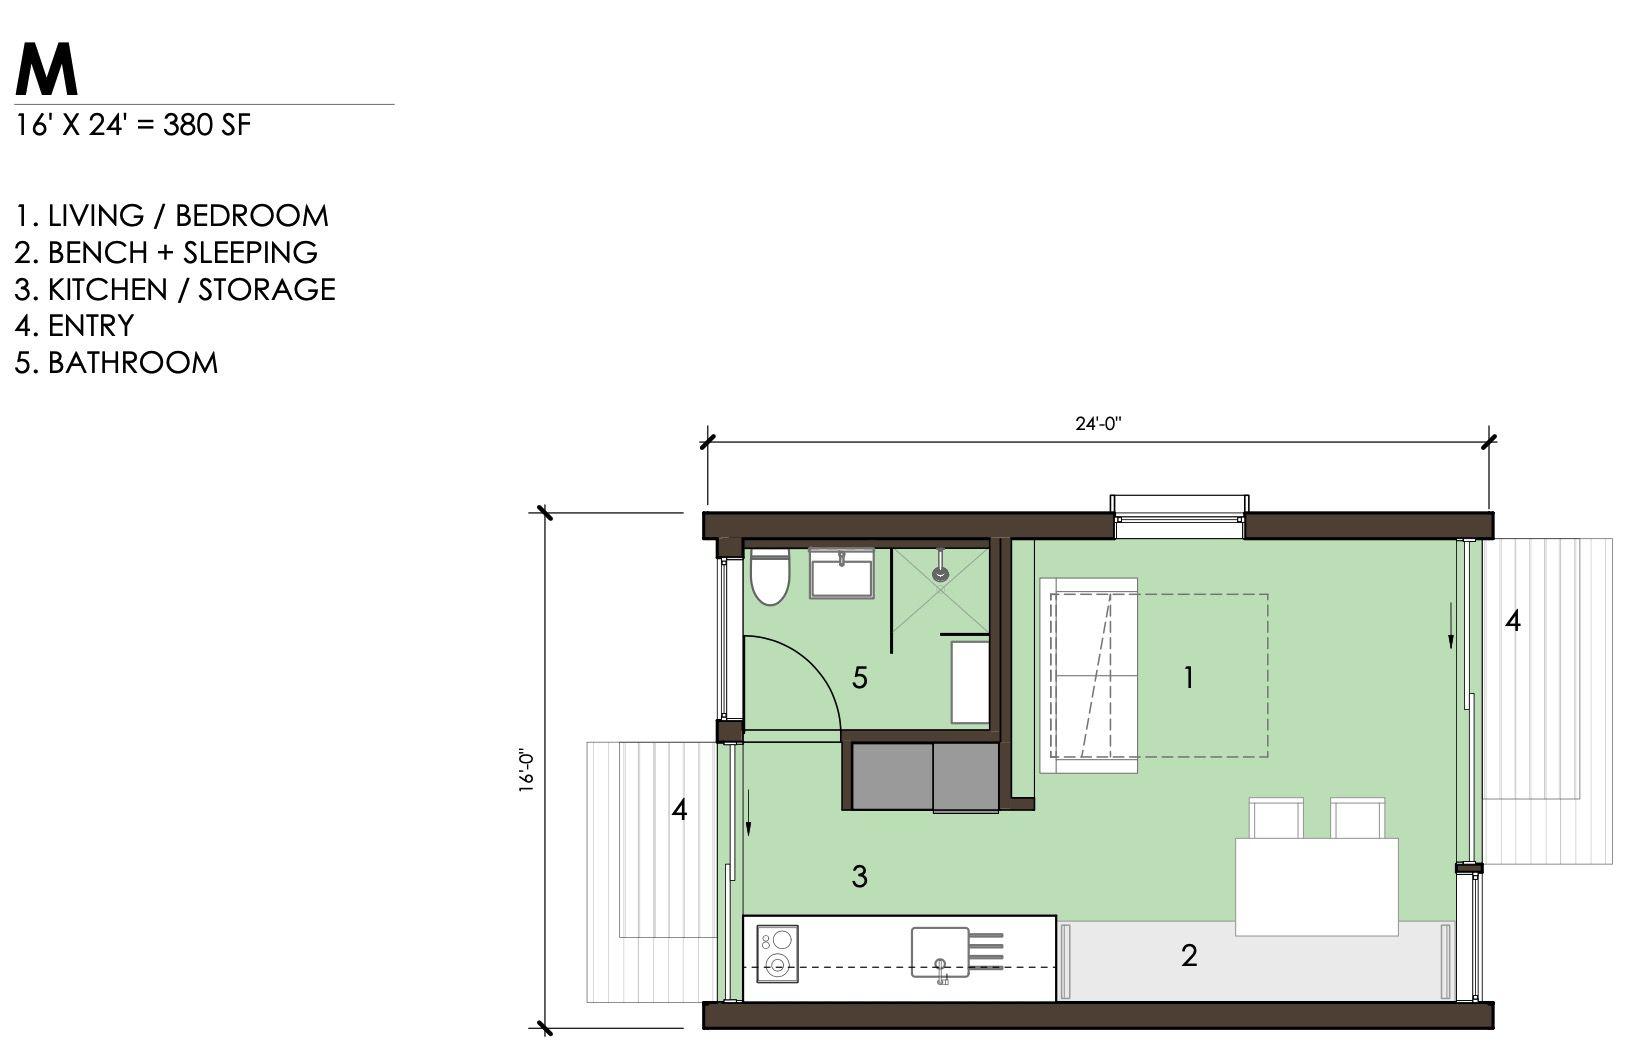 Unit M floor plan